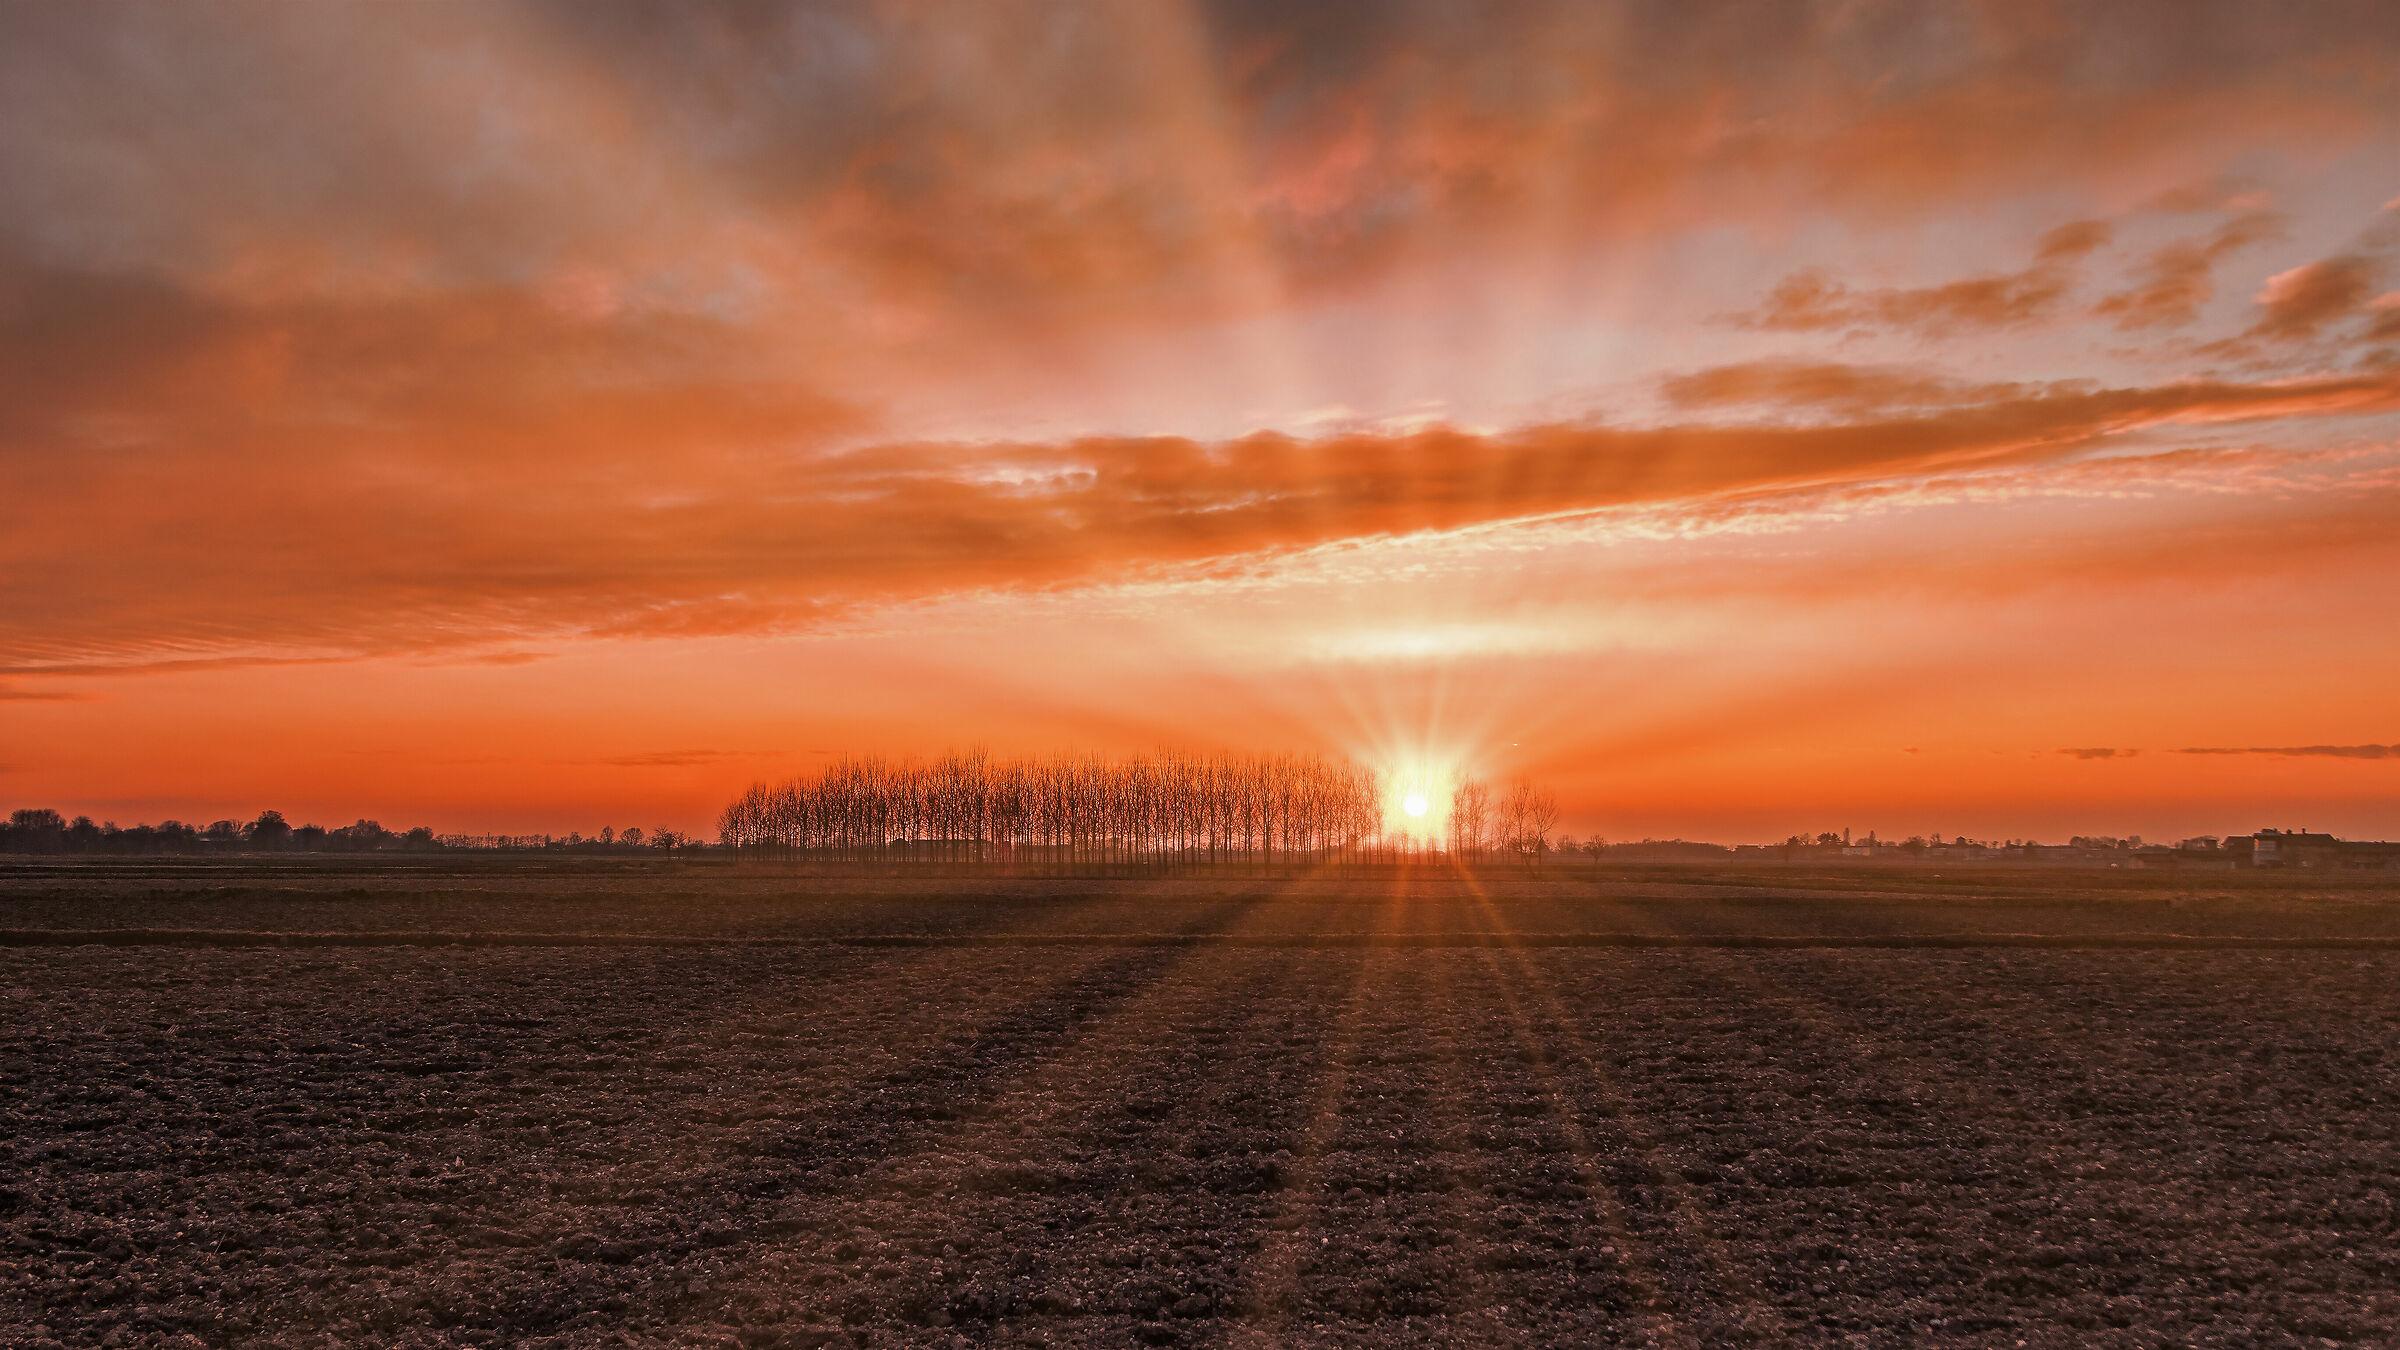 An unusual sunset...